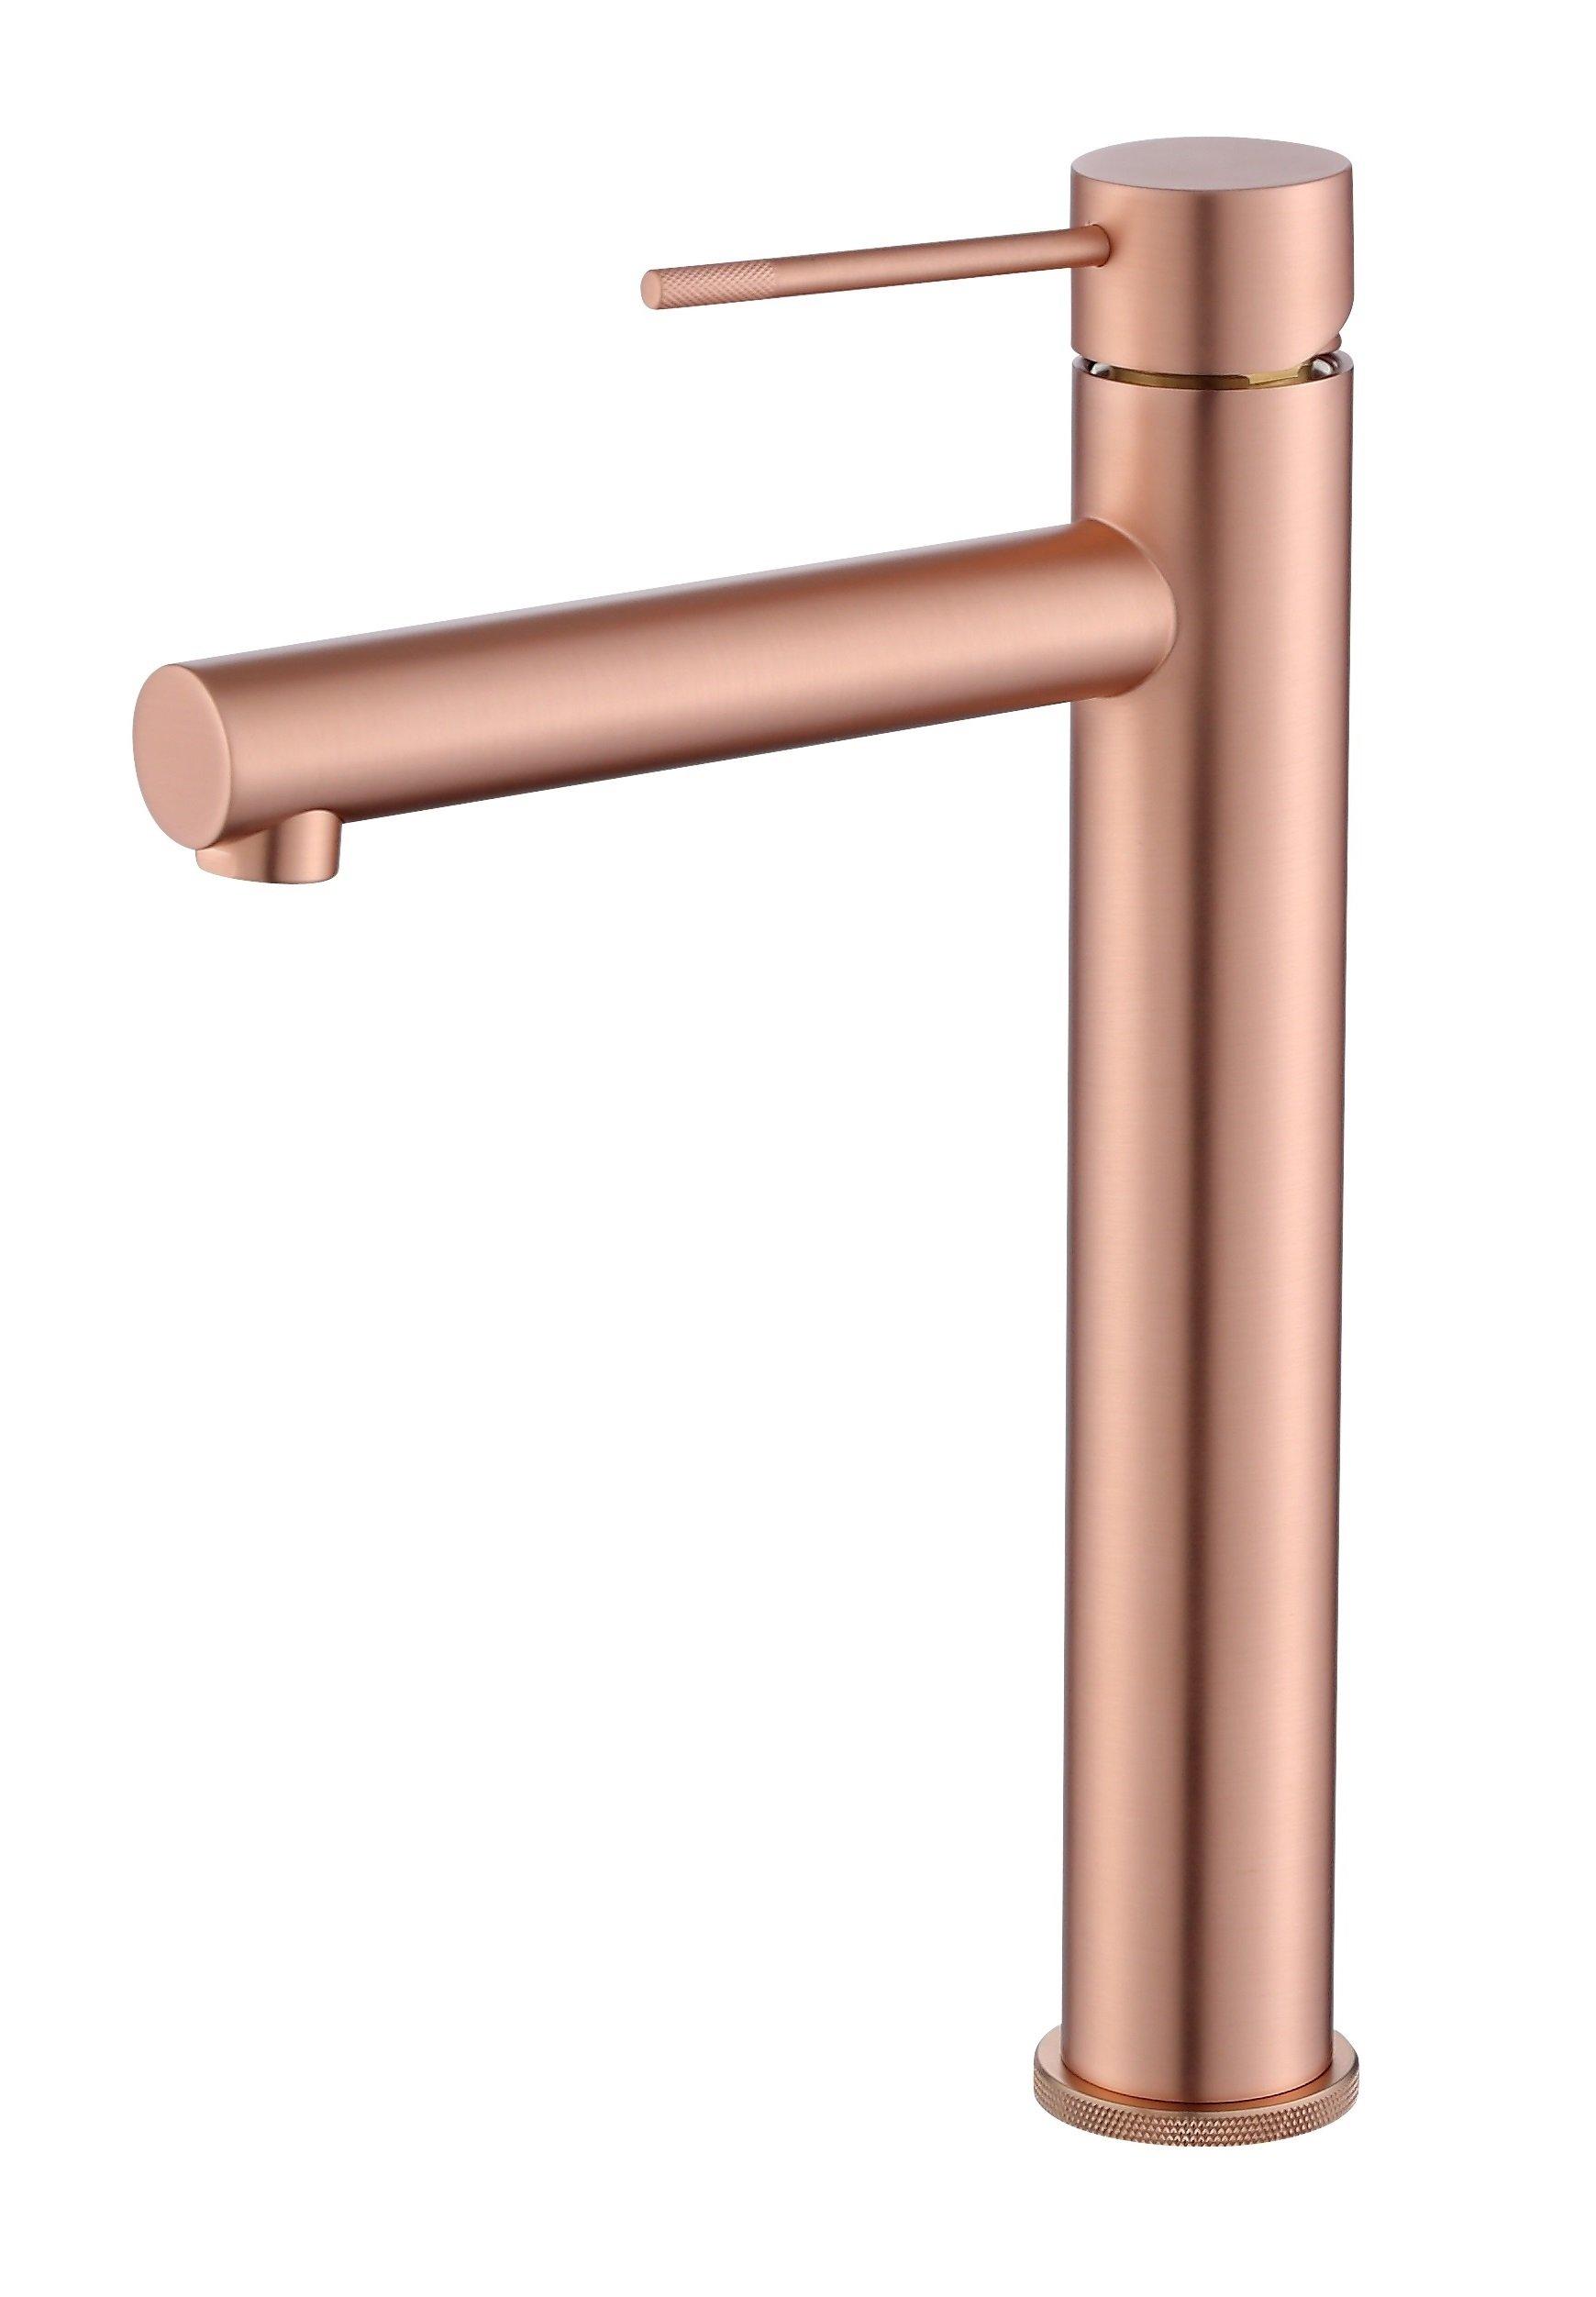 Best Design Lyon hoge wastafel mengkraan 30 cm rose mat goud